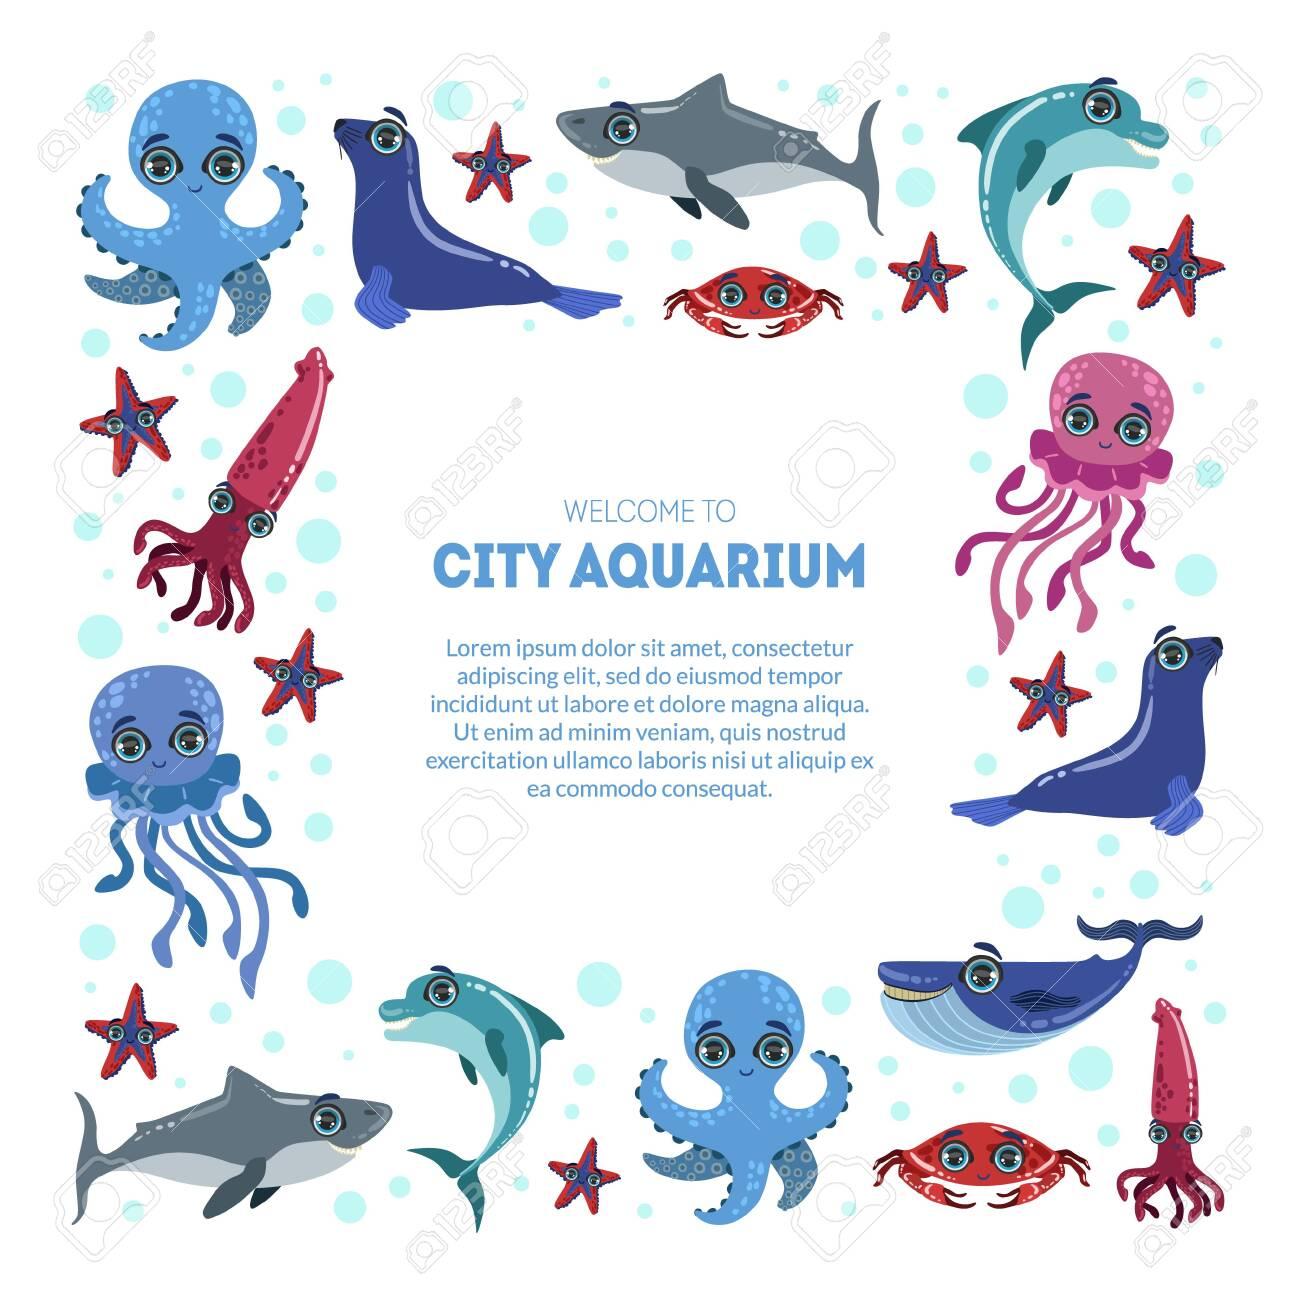 City Aquarium Exhibition Banner Template Flyer Poster Invitation